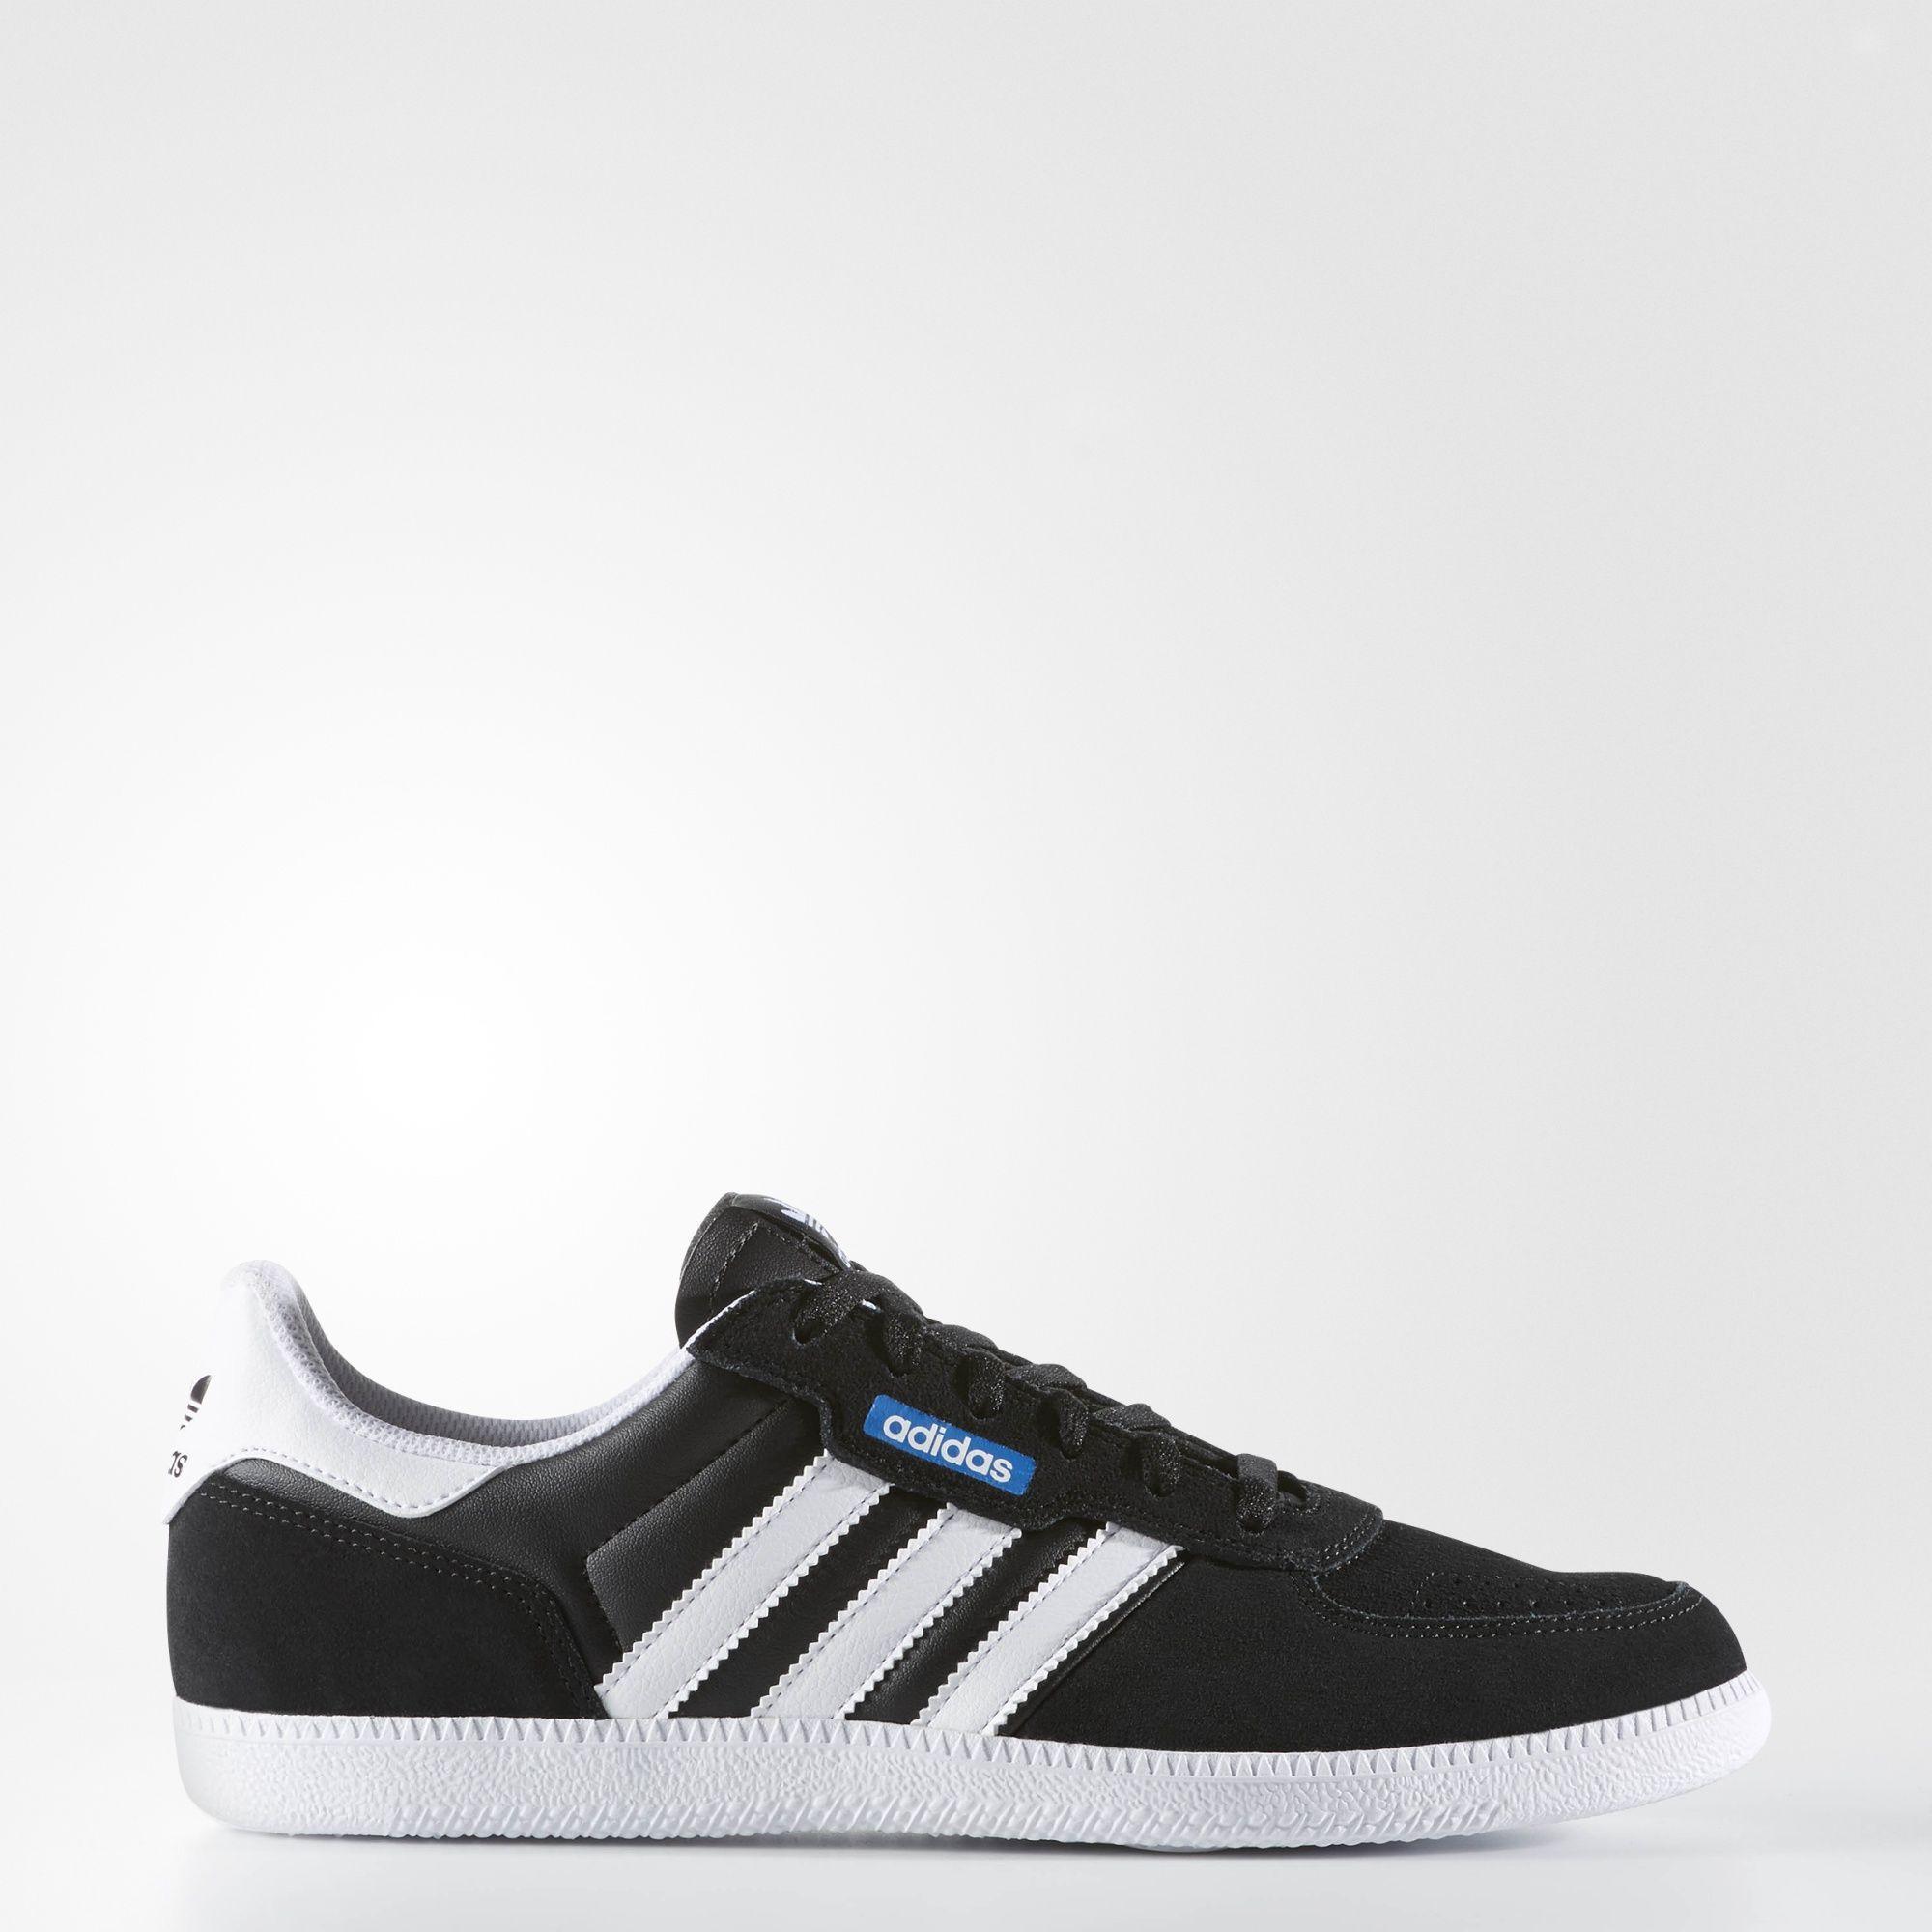 wholesale dealer 3c344 1225f adidas - Leonero Shoes